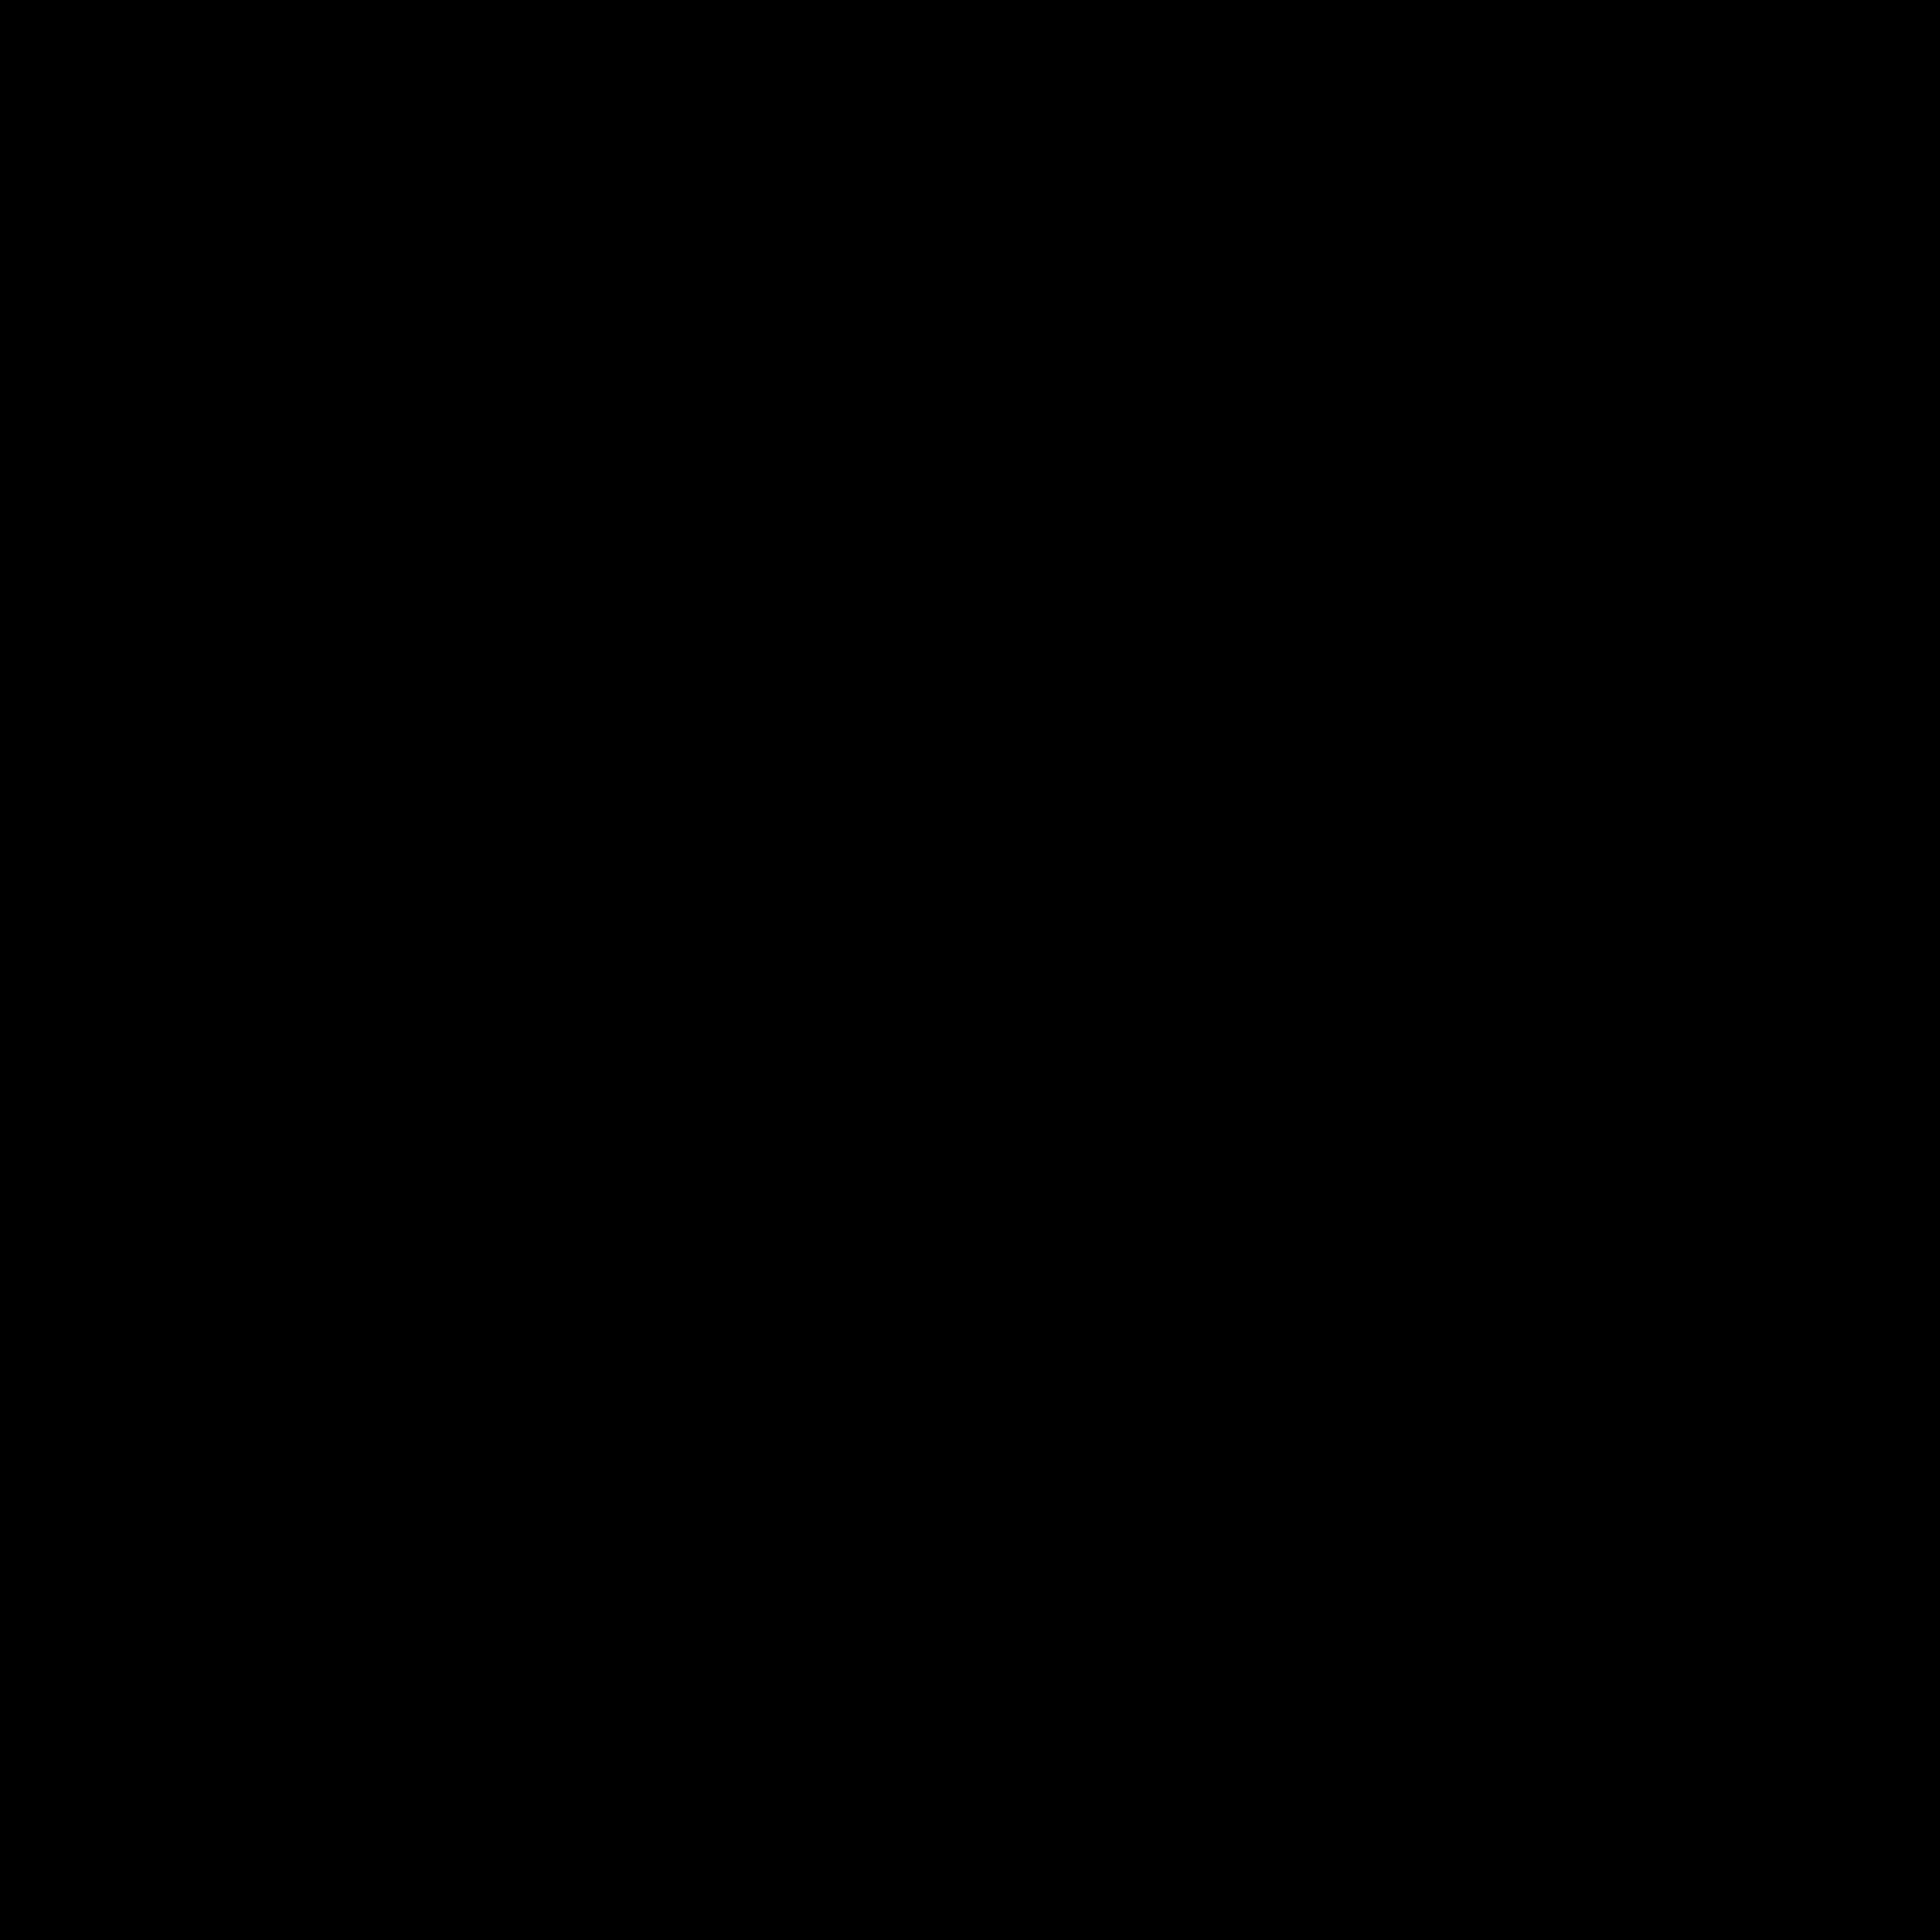 Clipart swastik 1 big image png biocorpaavc